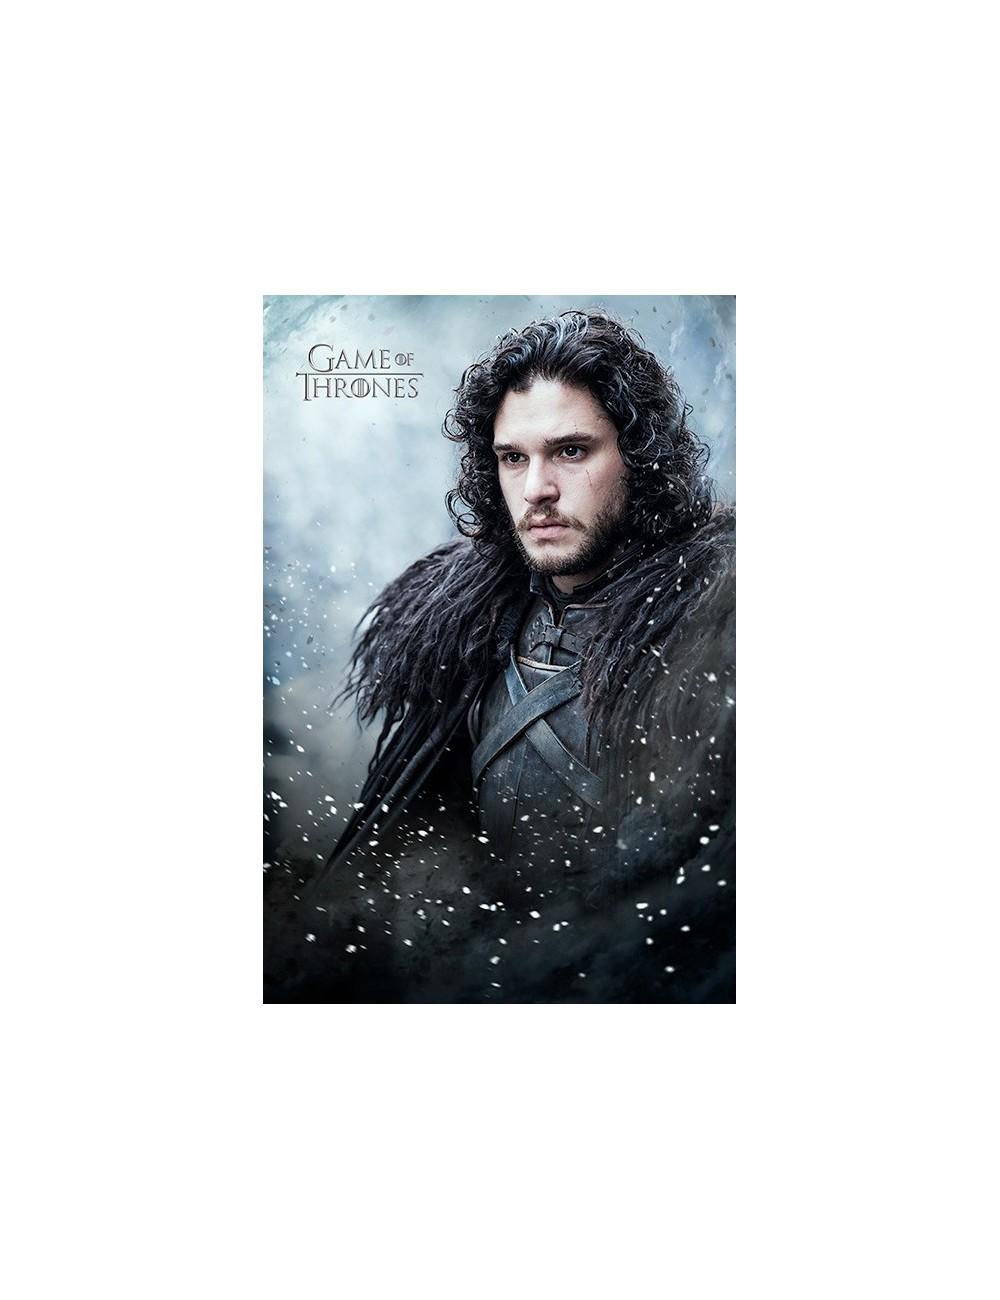 Poster Games of Thrones (Jon Snow), 61 x 91,5 cm